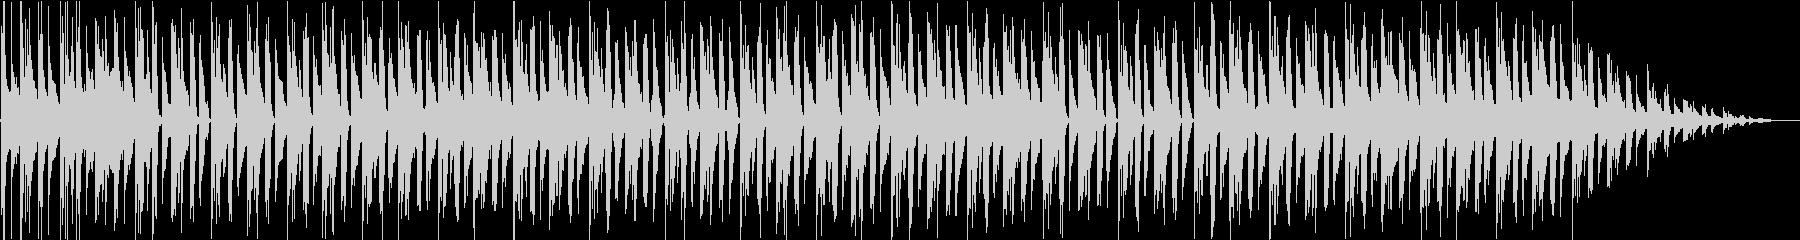 b)ラジオ風 古き良き時代のピアノビートの未再生の波形